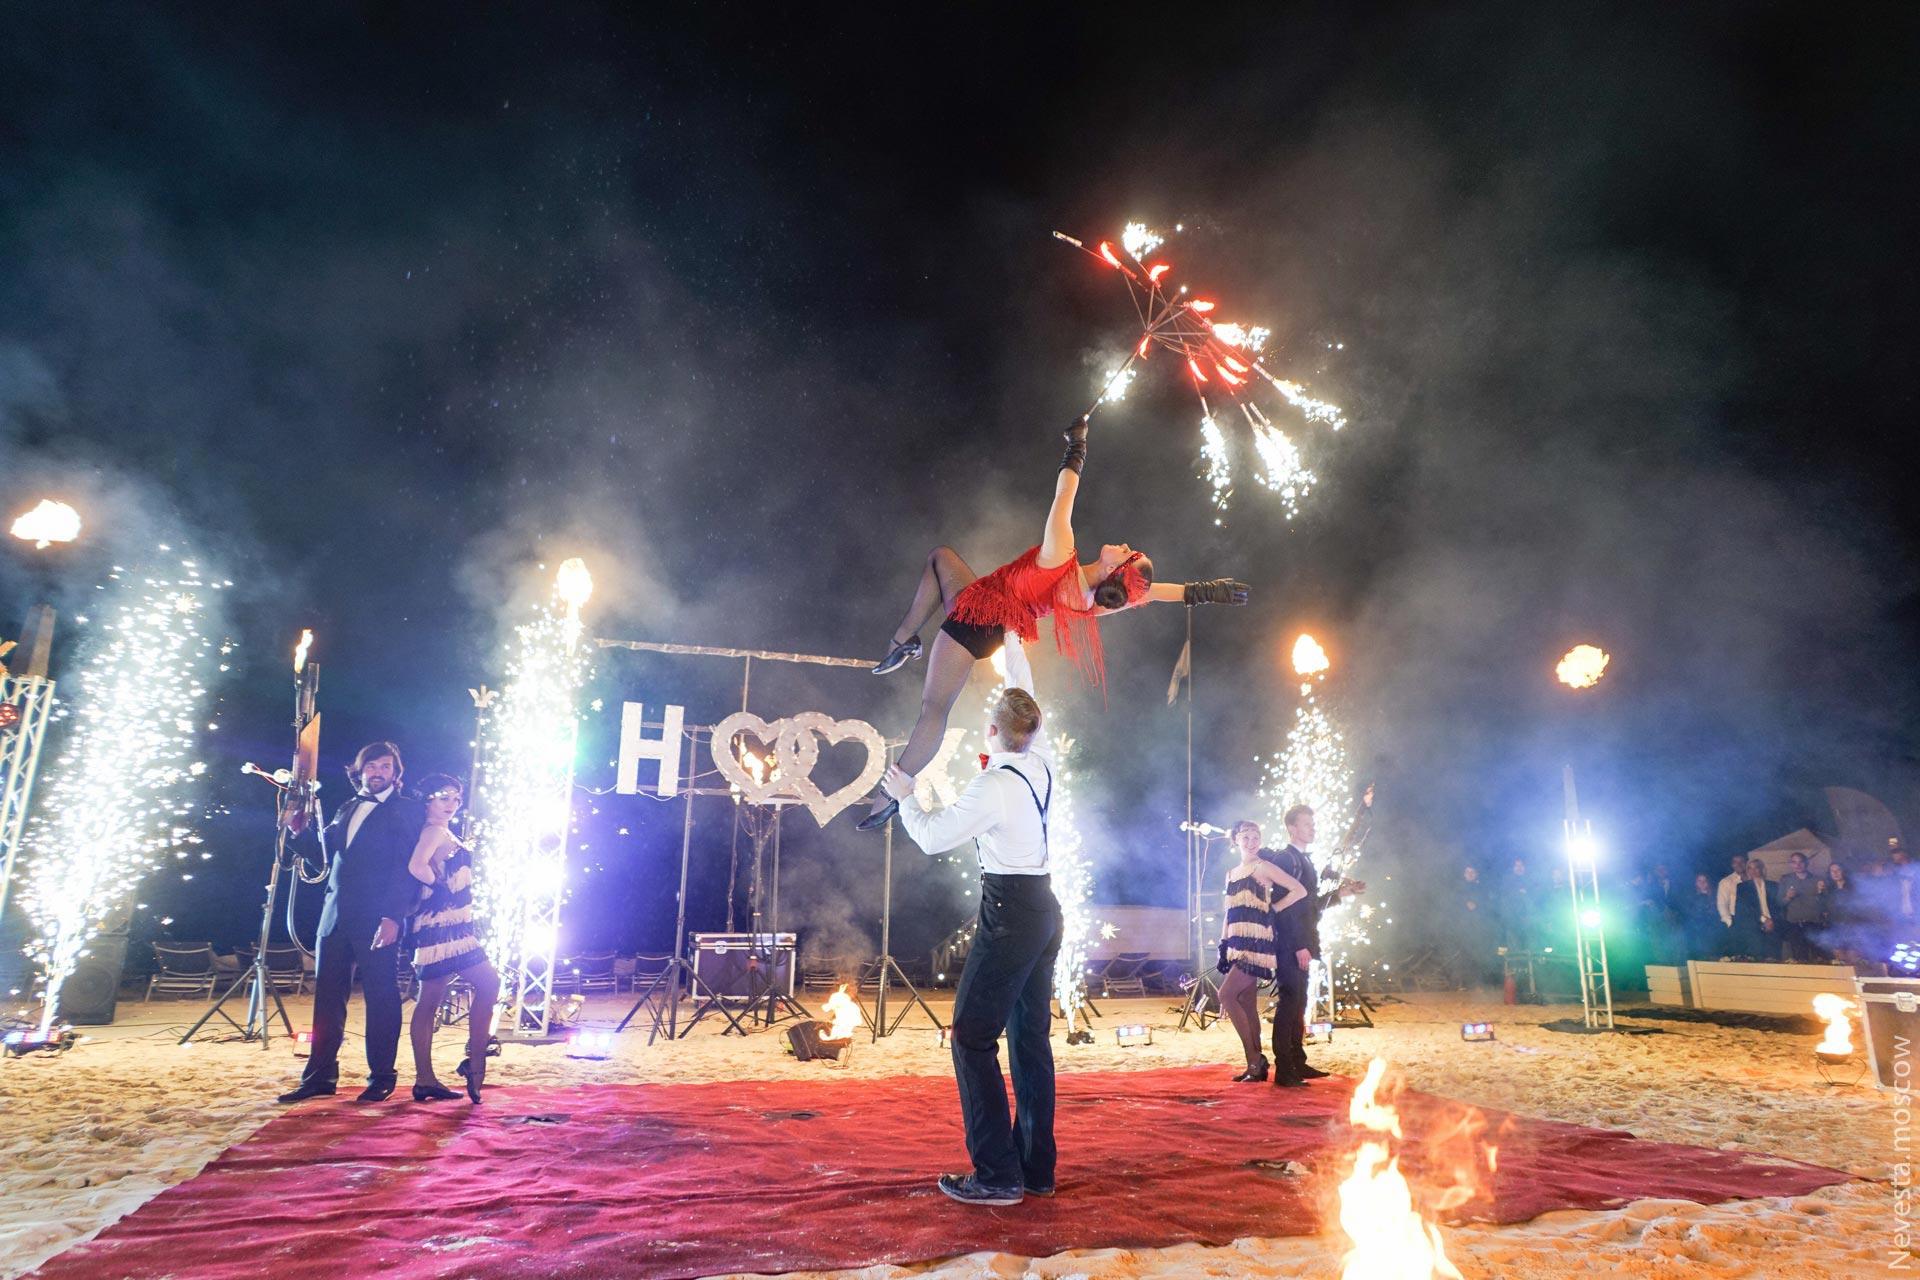 Свадьба Нелли Ермолаевой и Кирилла Андреева фото 52